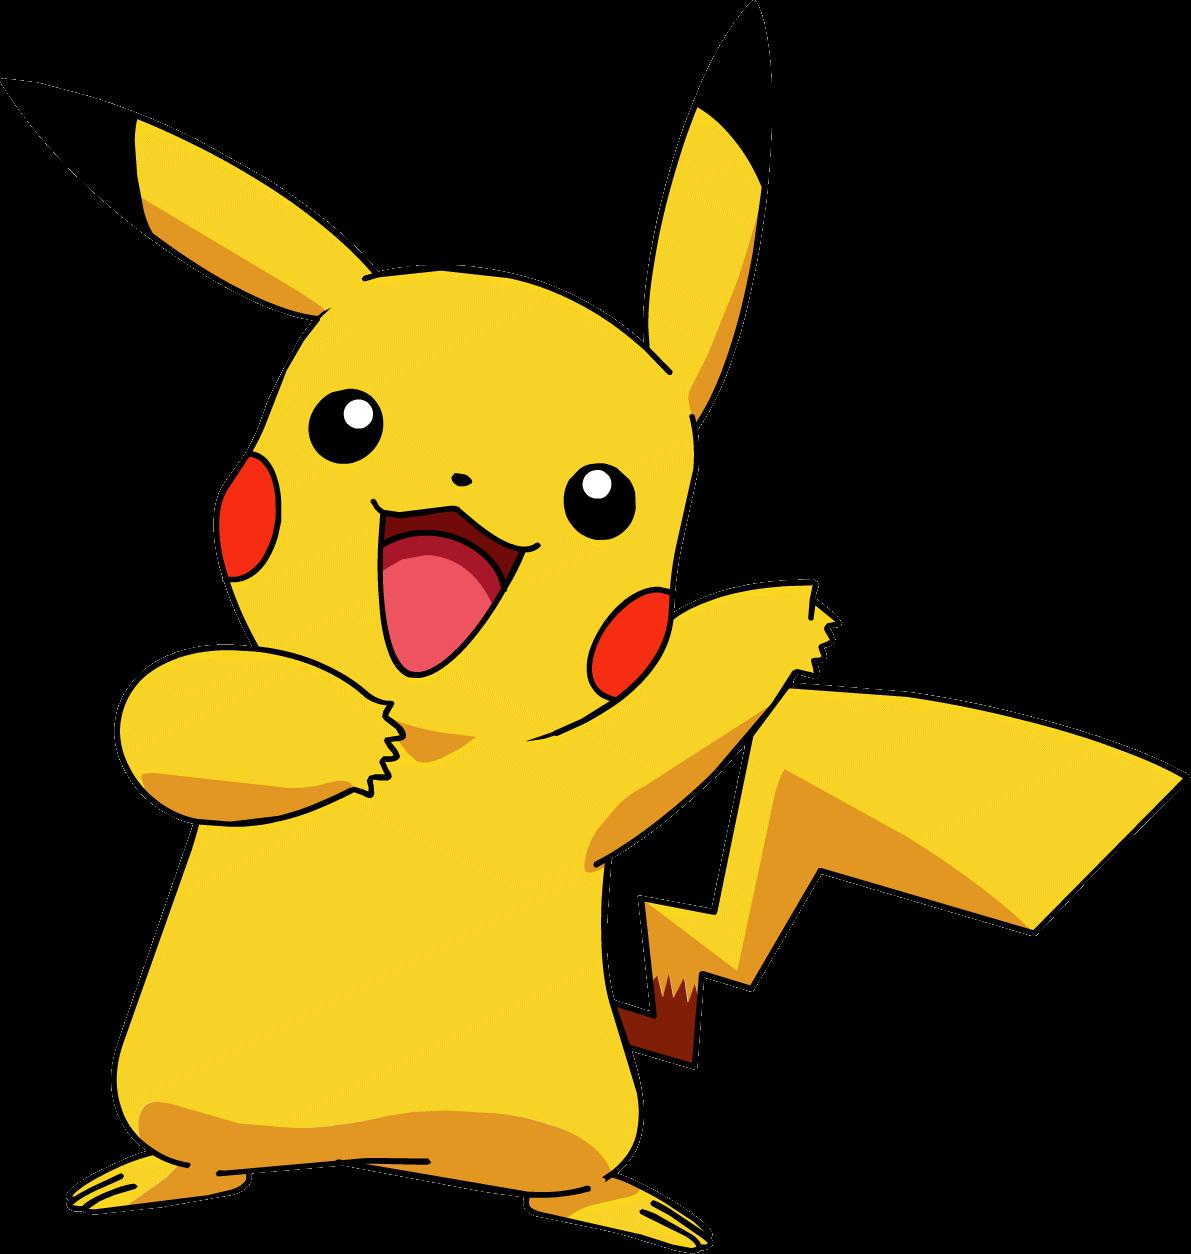 Pokemon png images. Pikachu transparent stickpng